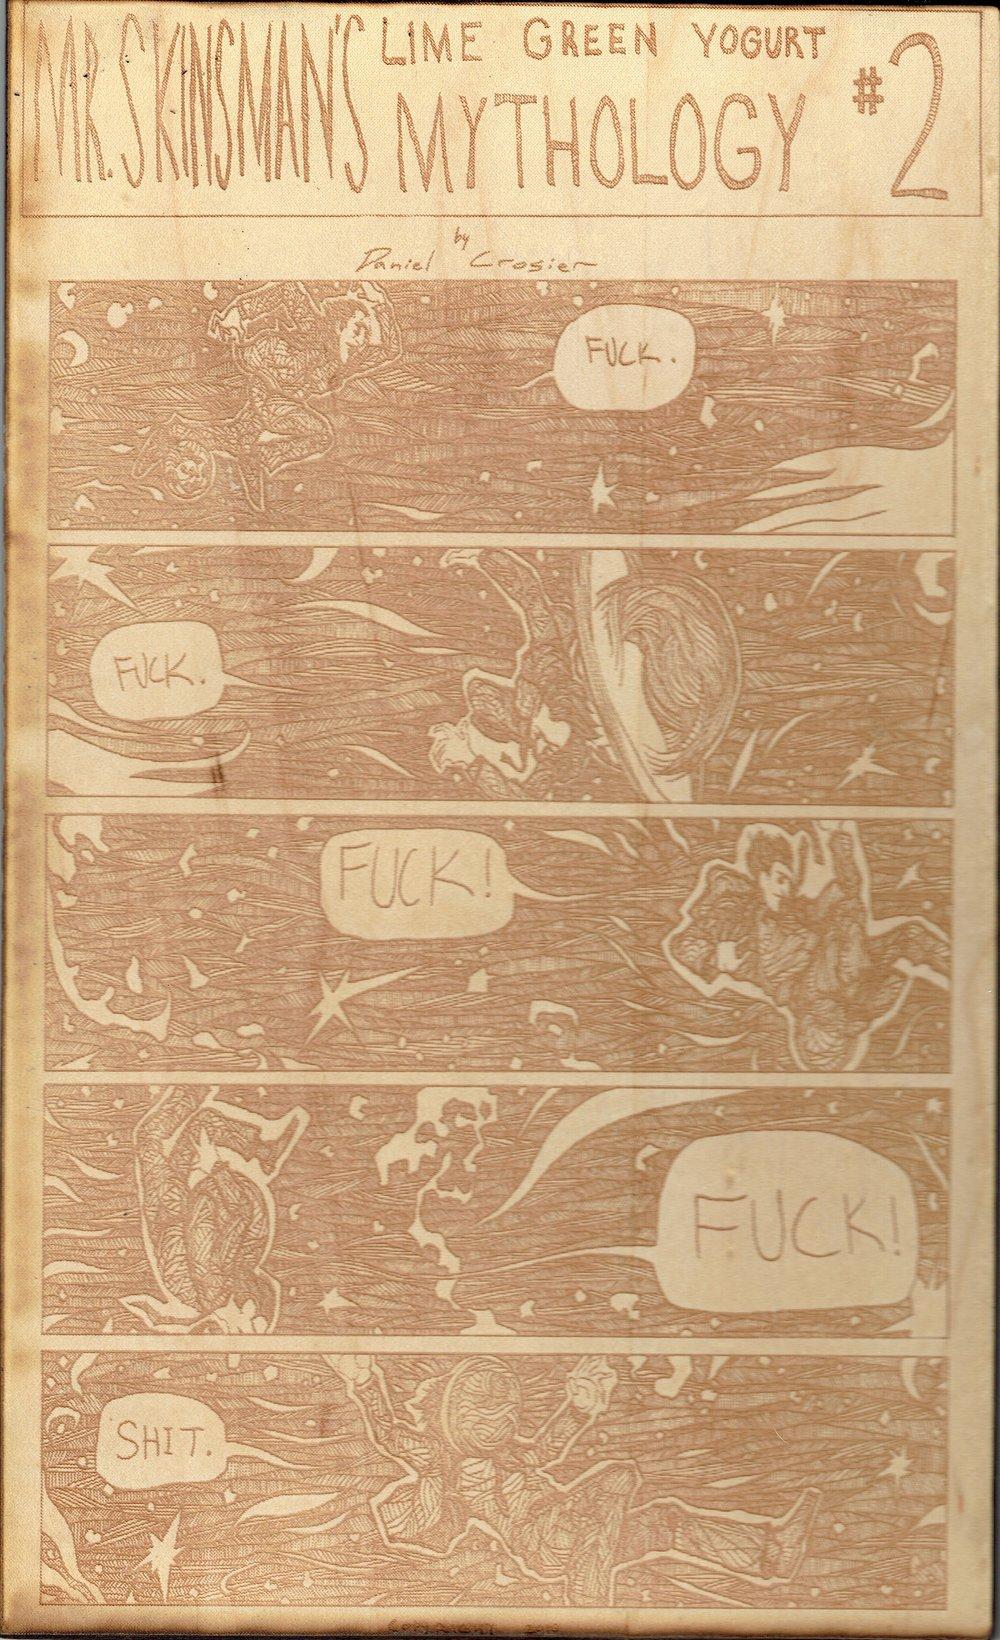 A page from Mr. Skinsman's Lime Green Yogurt Mythology #1 by Daniel Crosier.